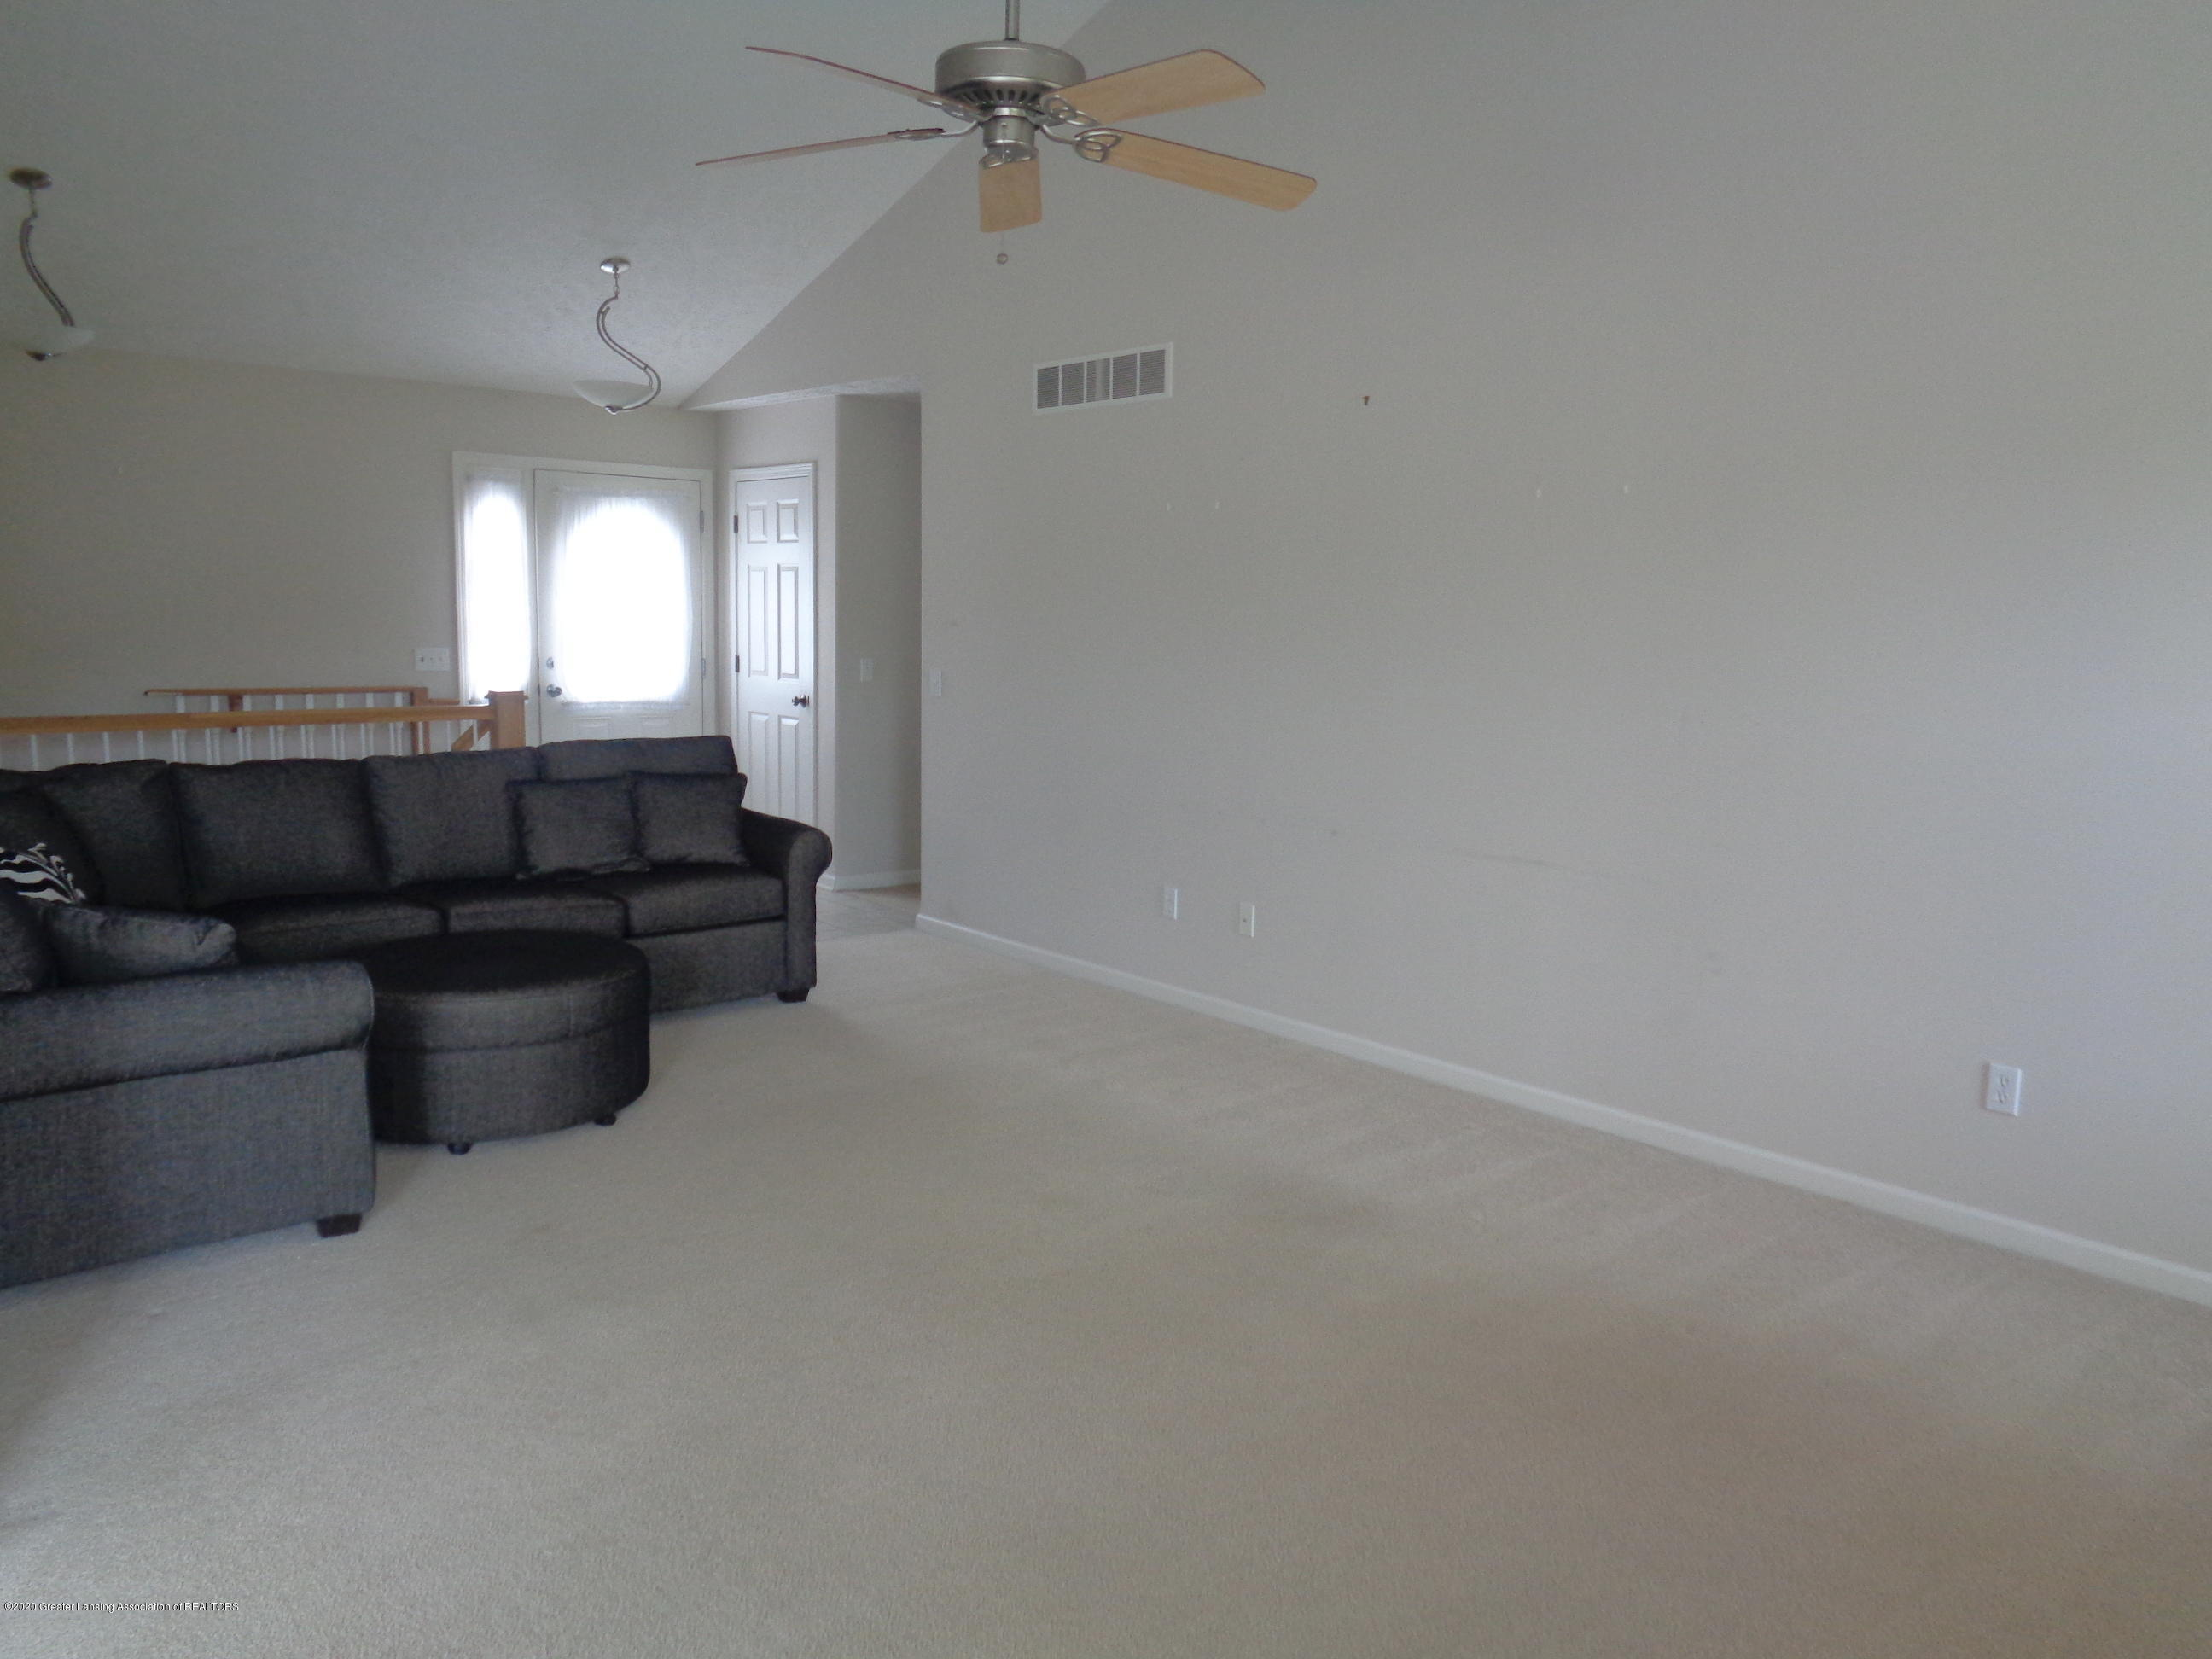 2067 Wovenheart Dr - woven heart living room - 3